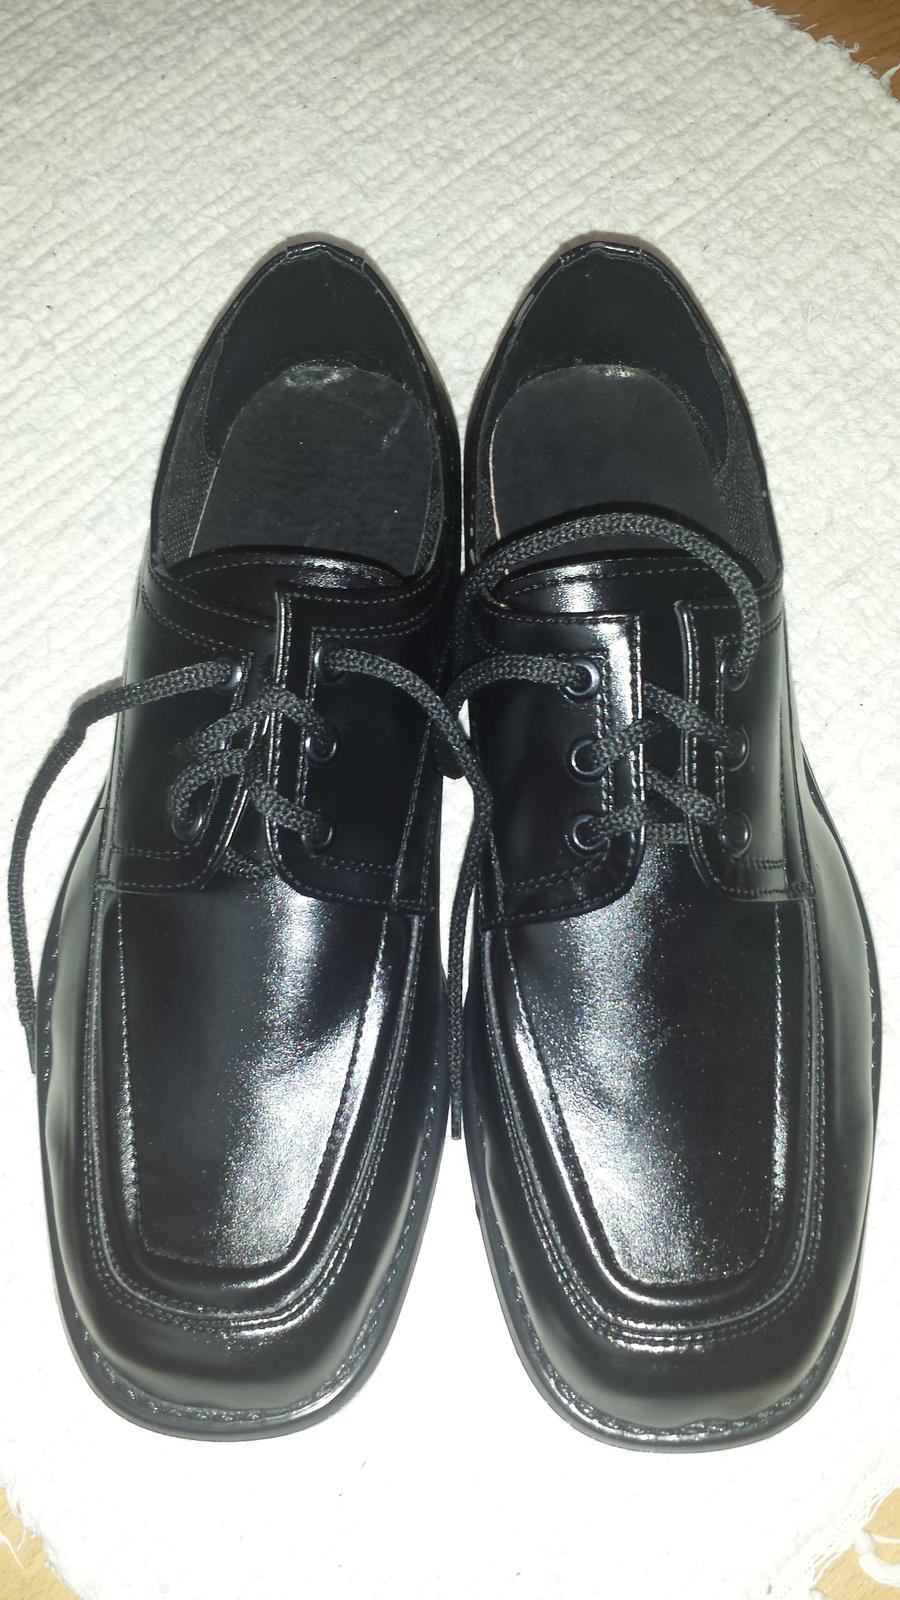 3f531d99f1 Panska spolocenska obuv